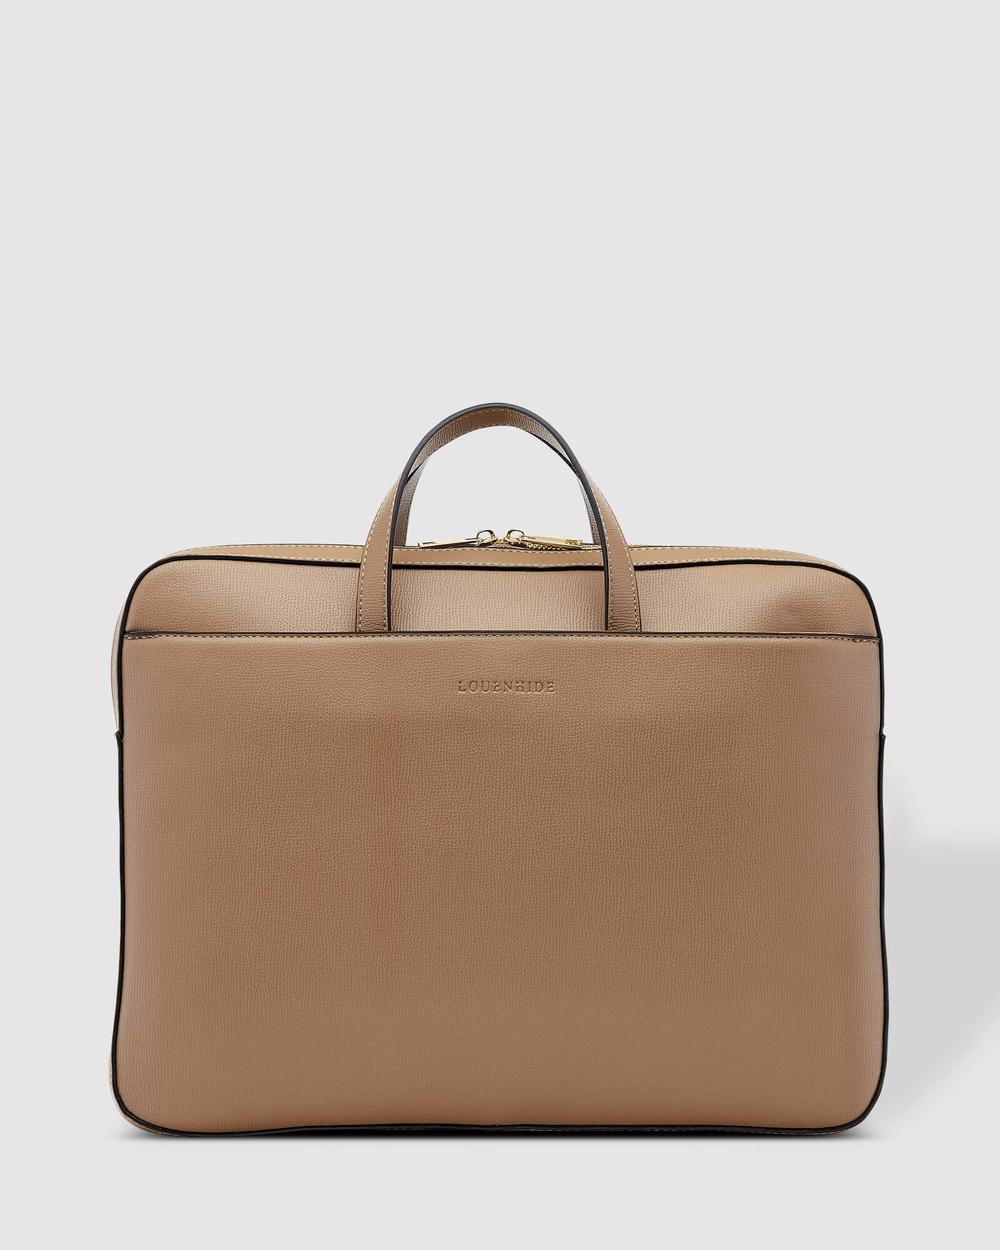 Louenhide Orleans Laptop Bag Bags Coffee Australia